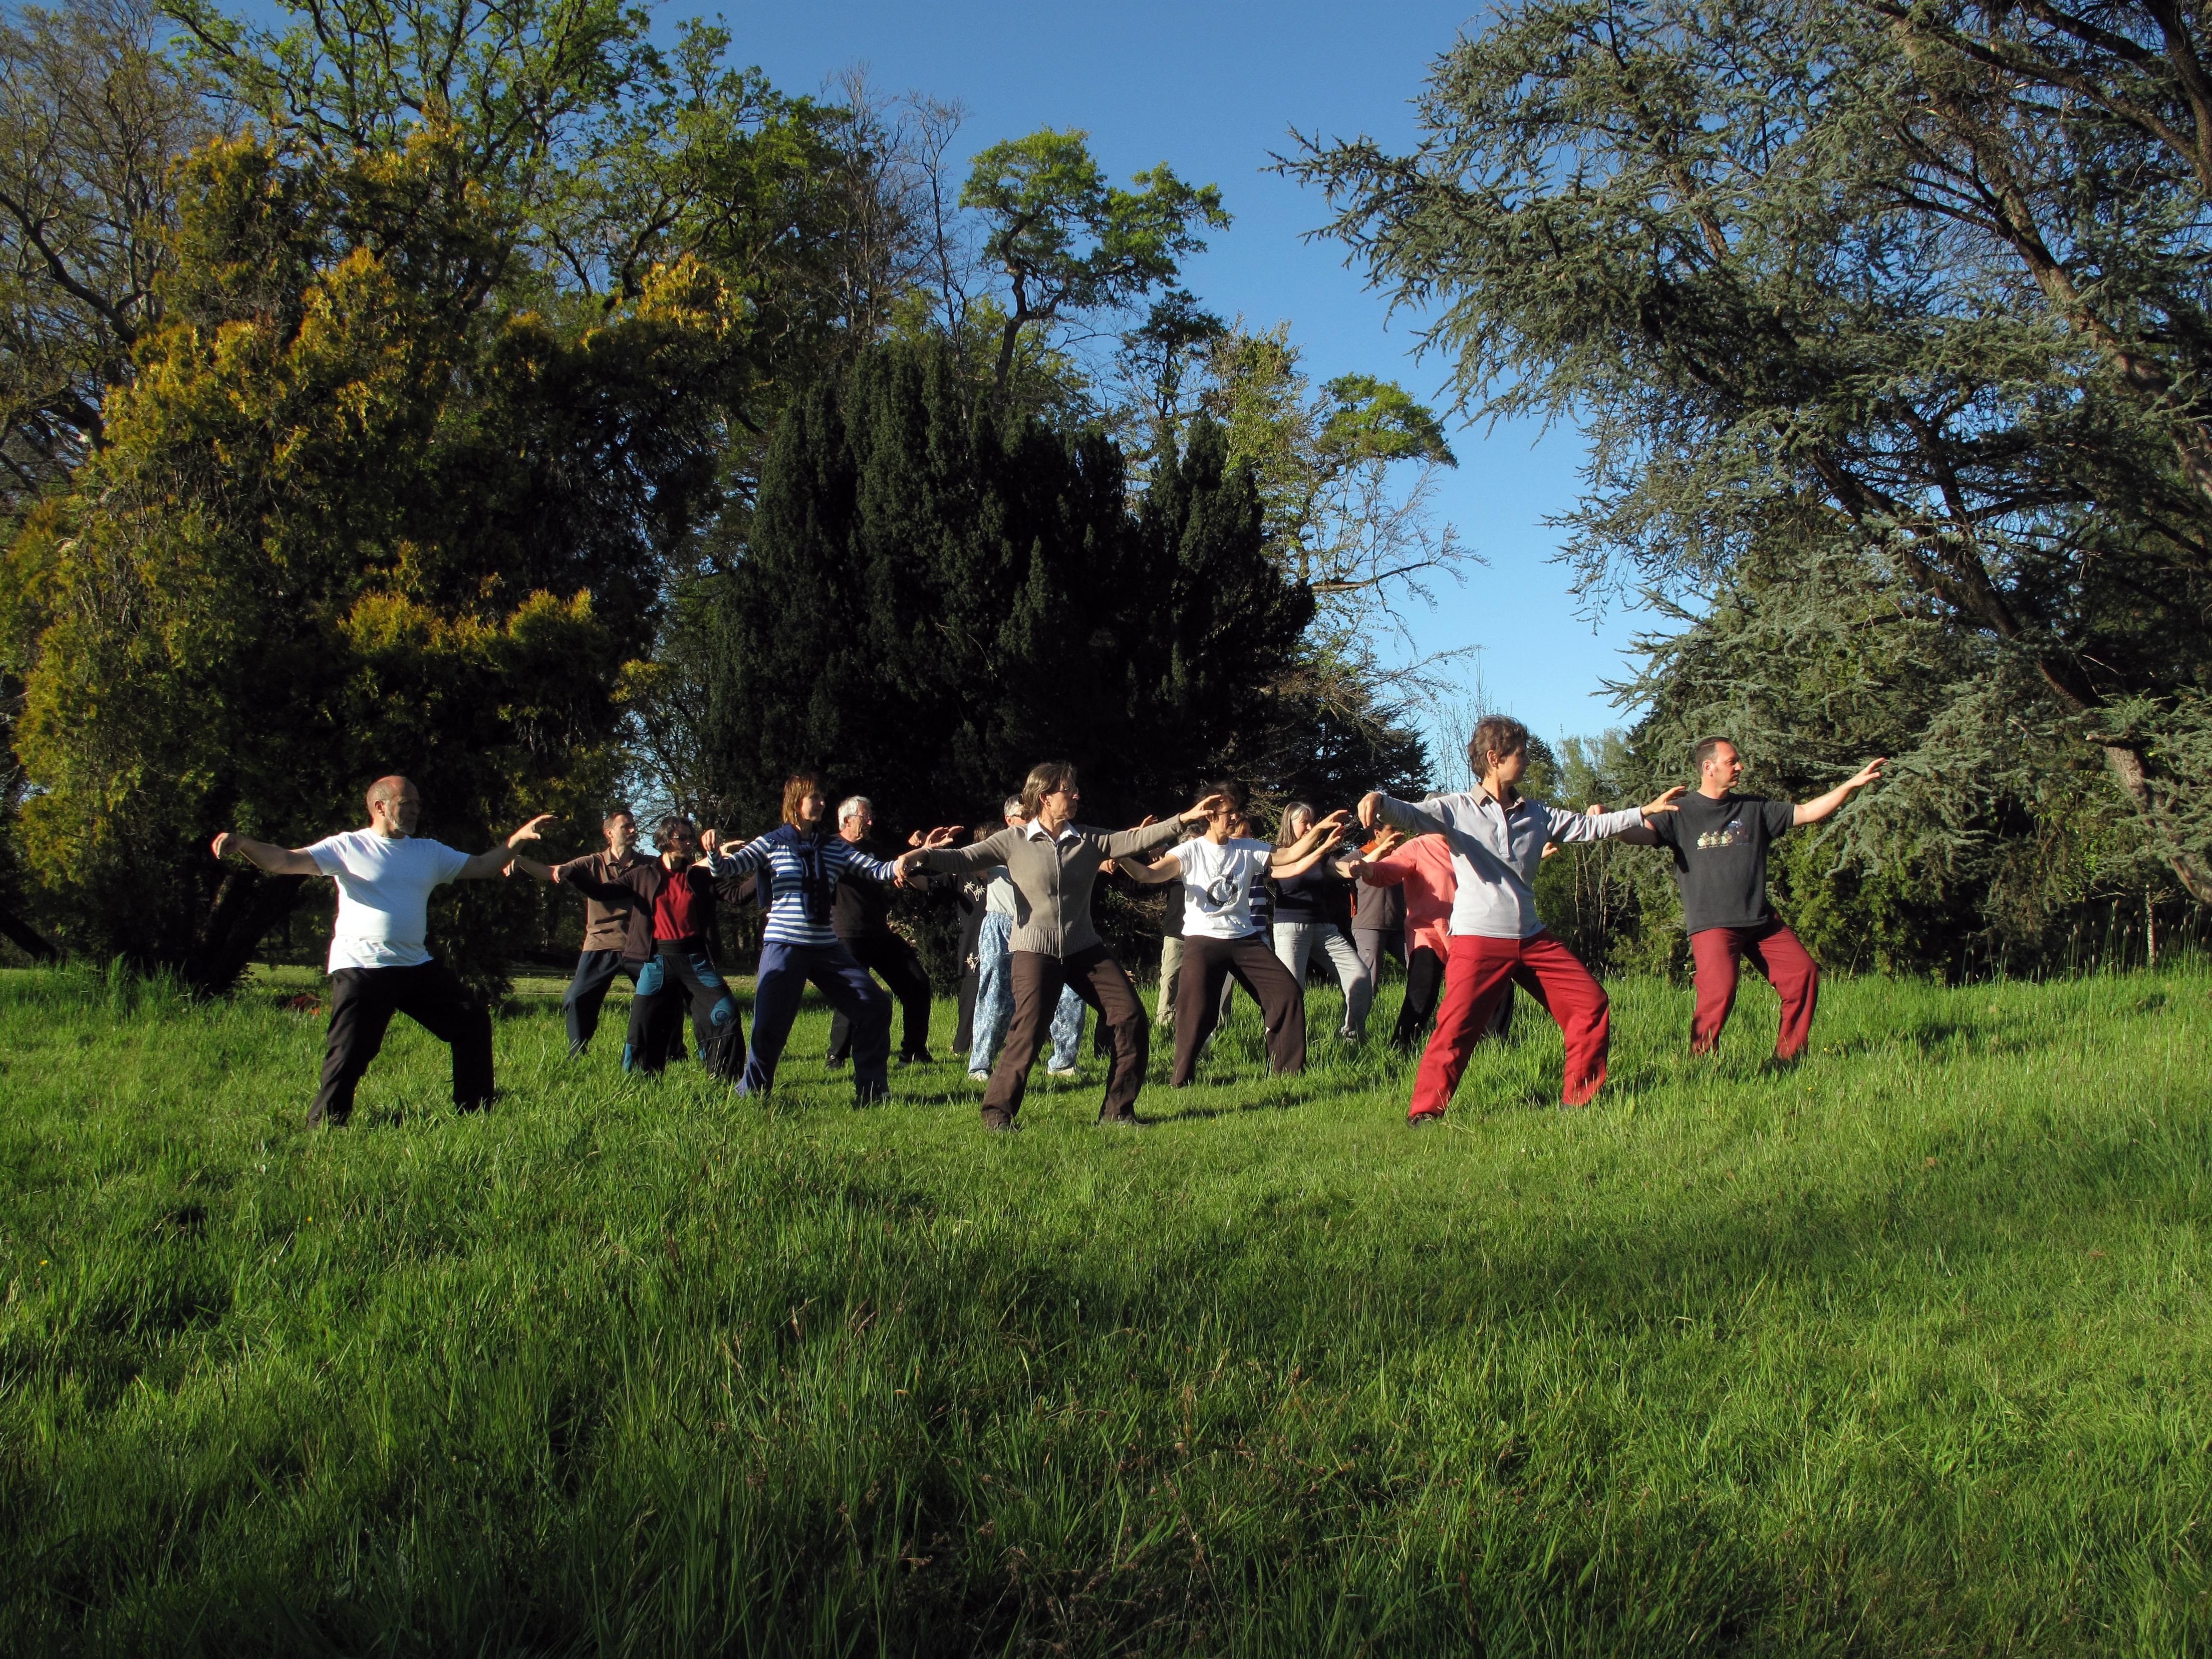 Un groupe de Tai Chi, île de Berder, Bretagne